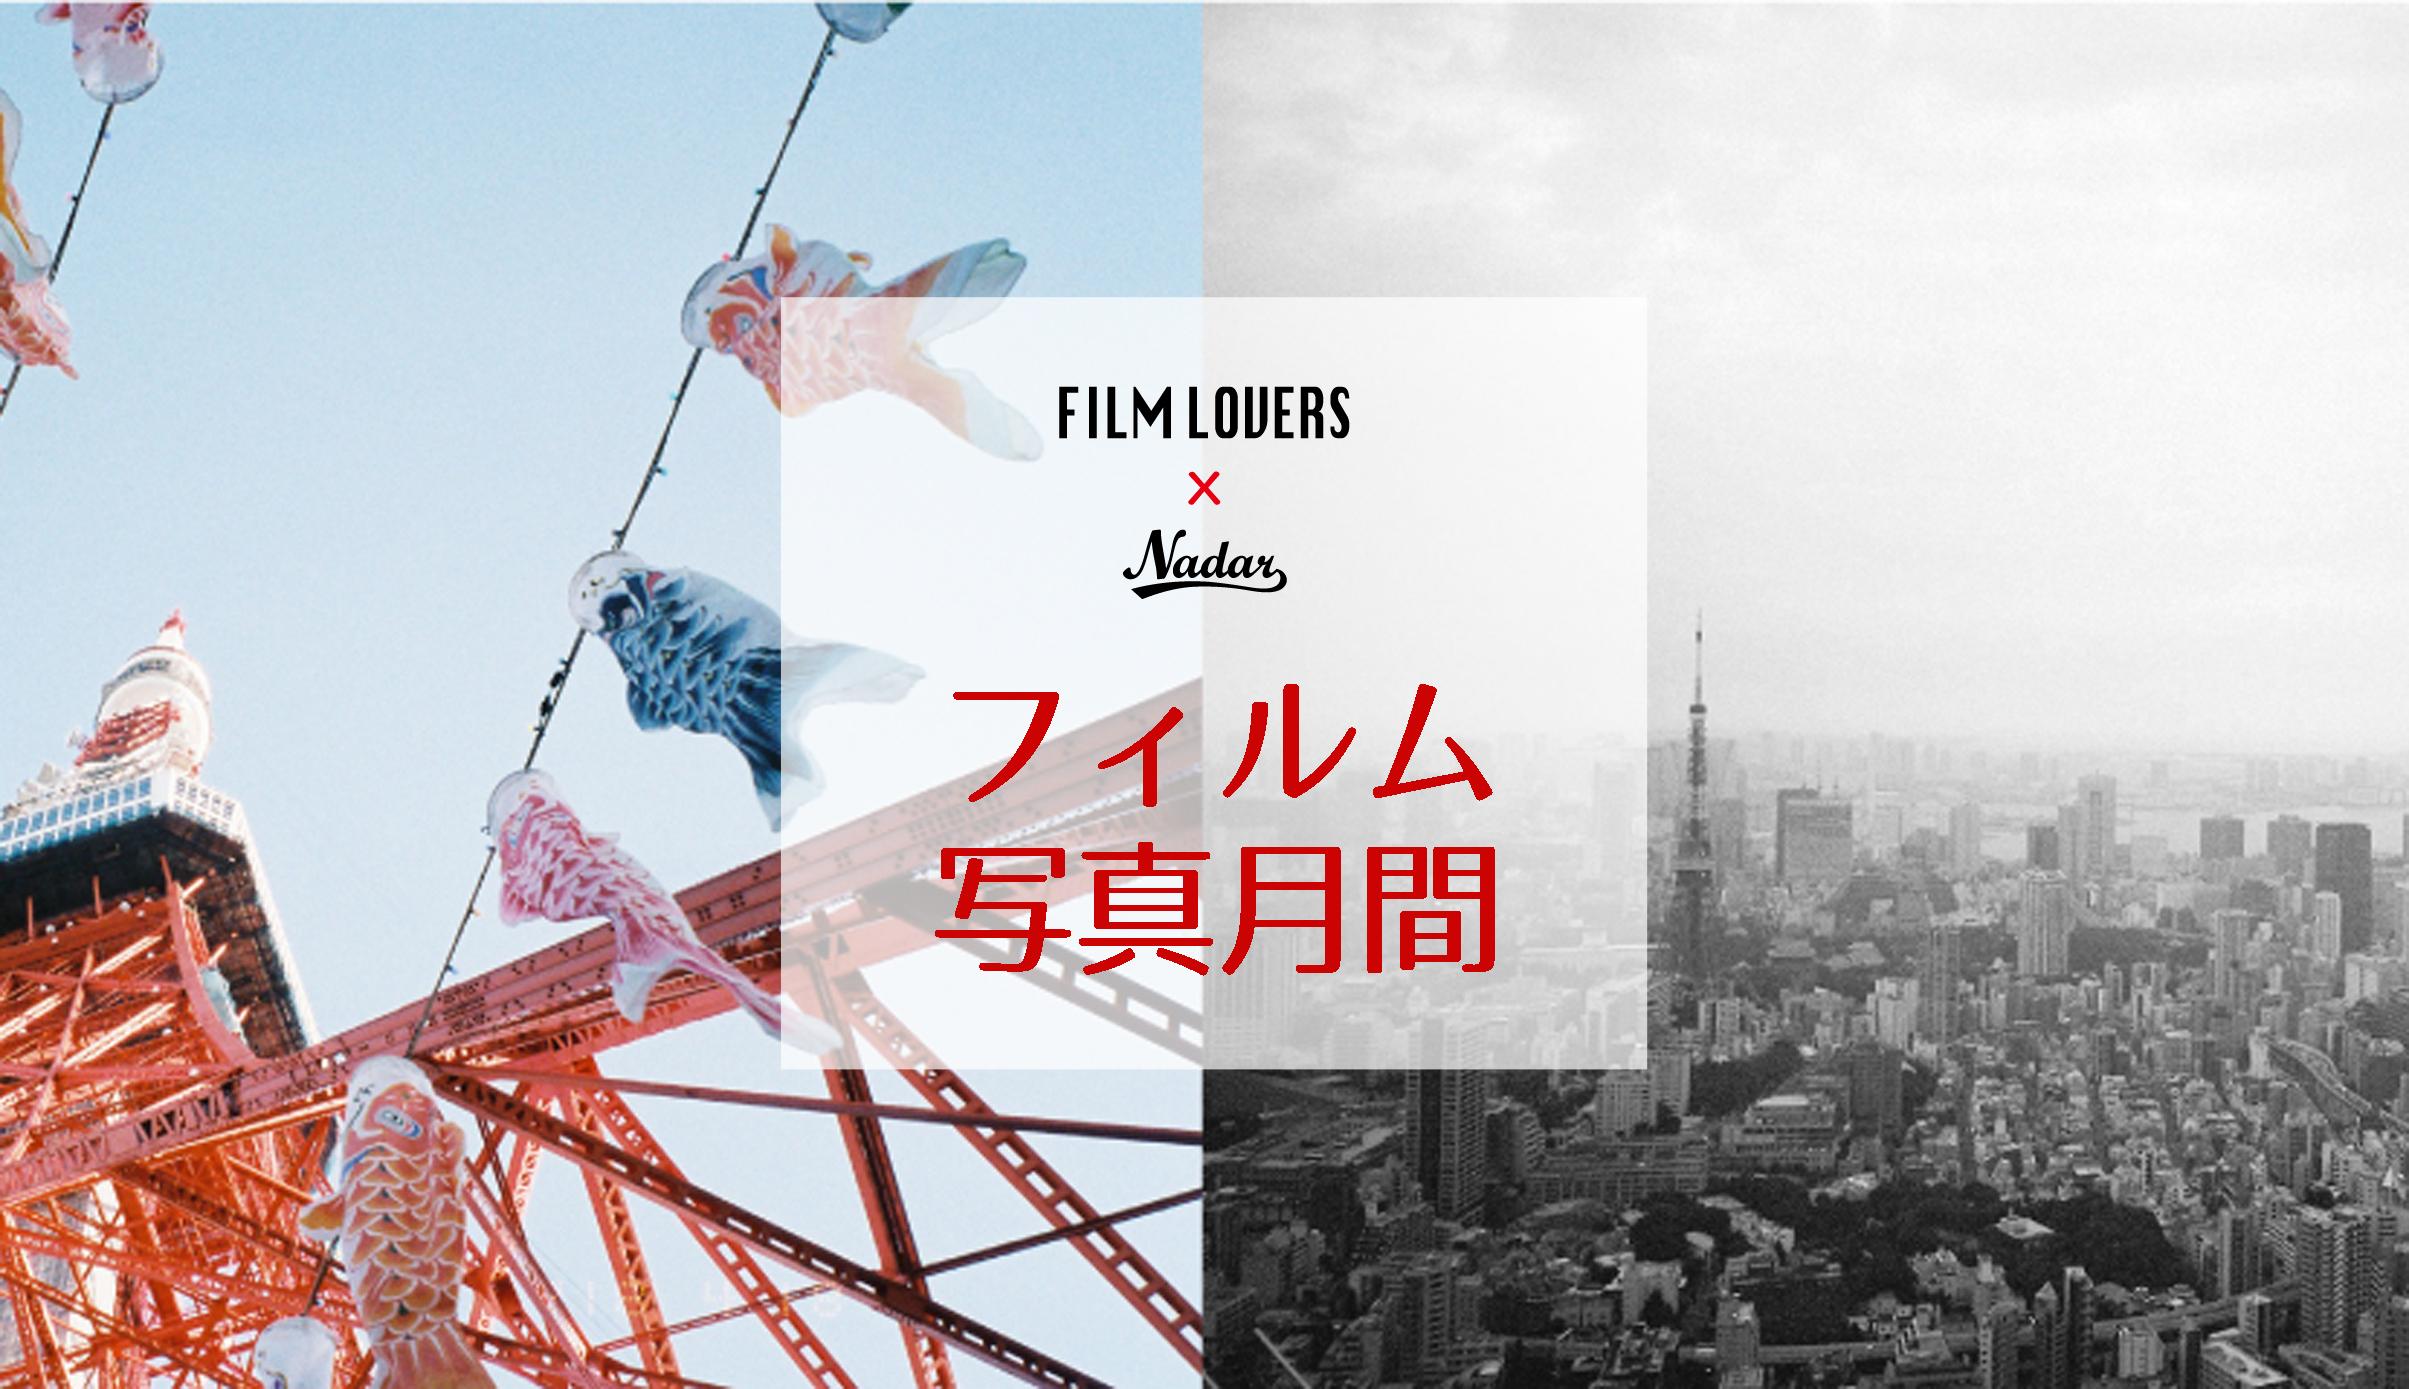 FILM LOVERS × NADAR フィルム写真月間2018出展者募集